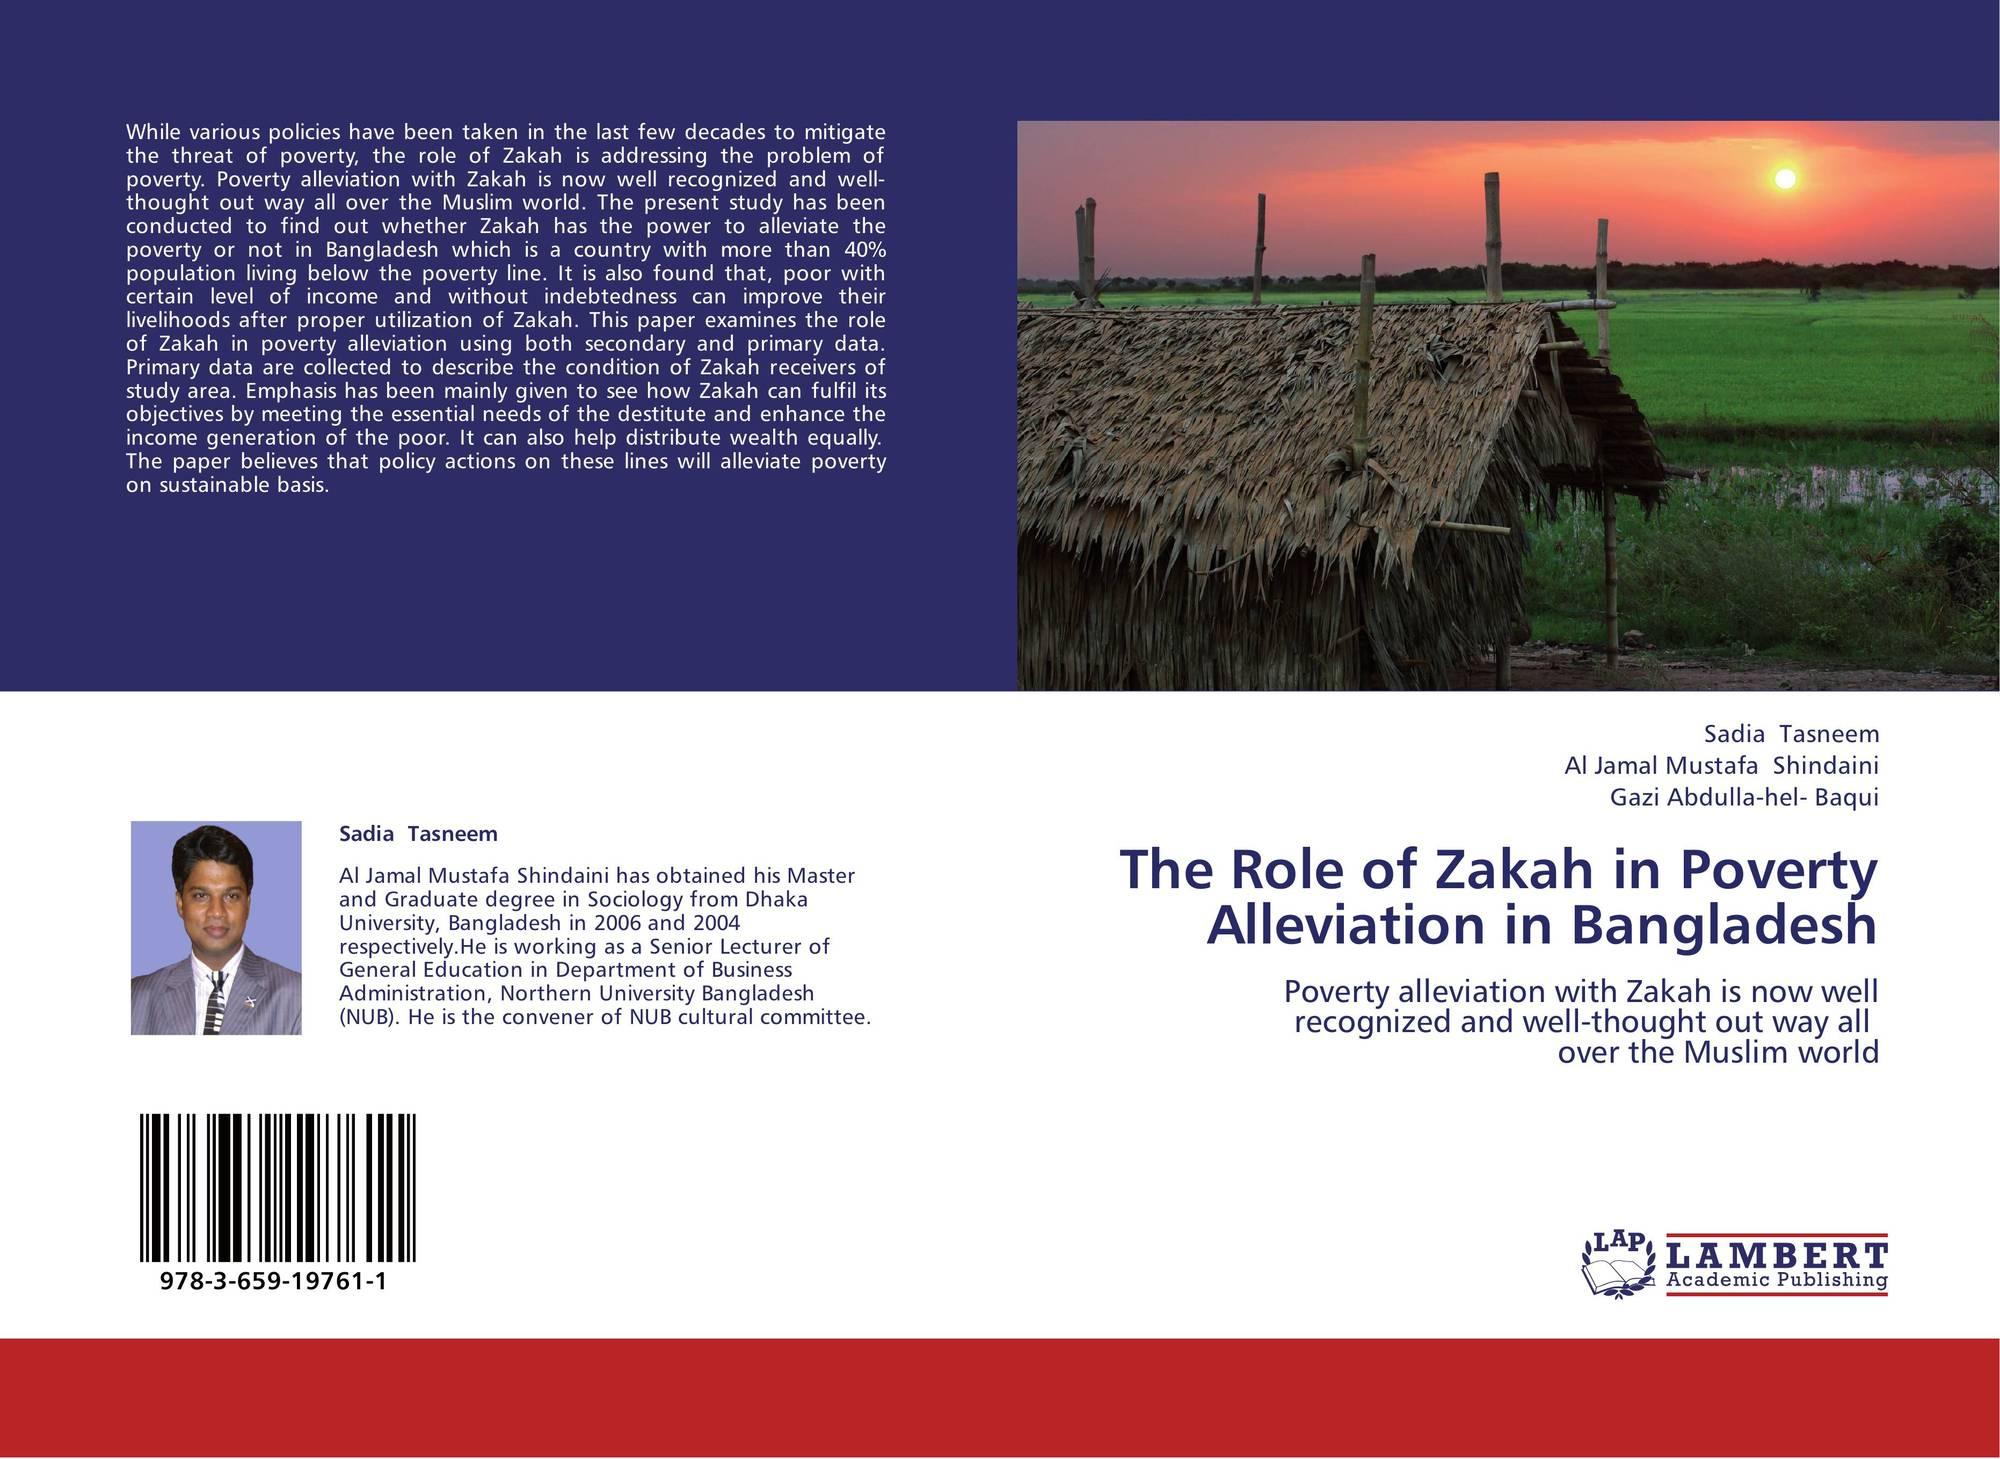 essay on poverty alleviation in bangladesh